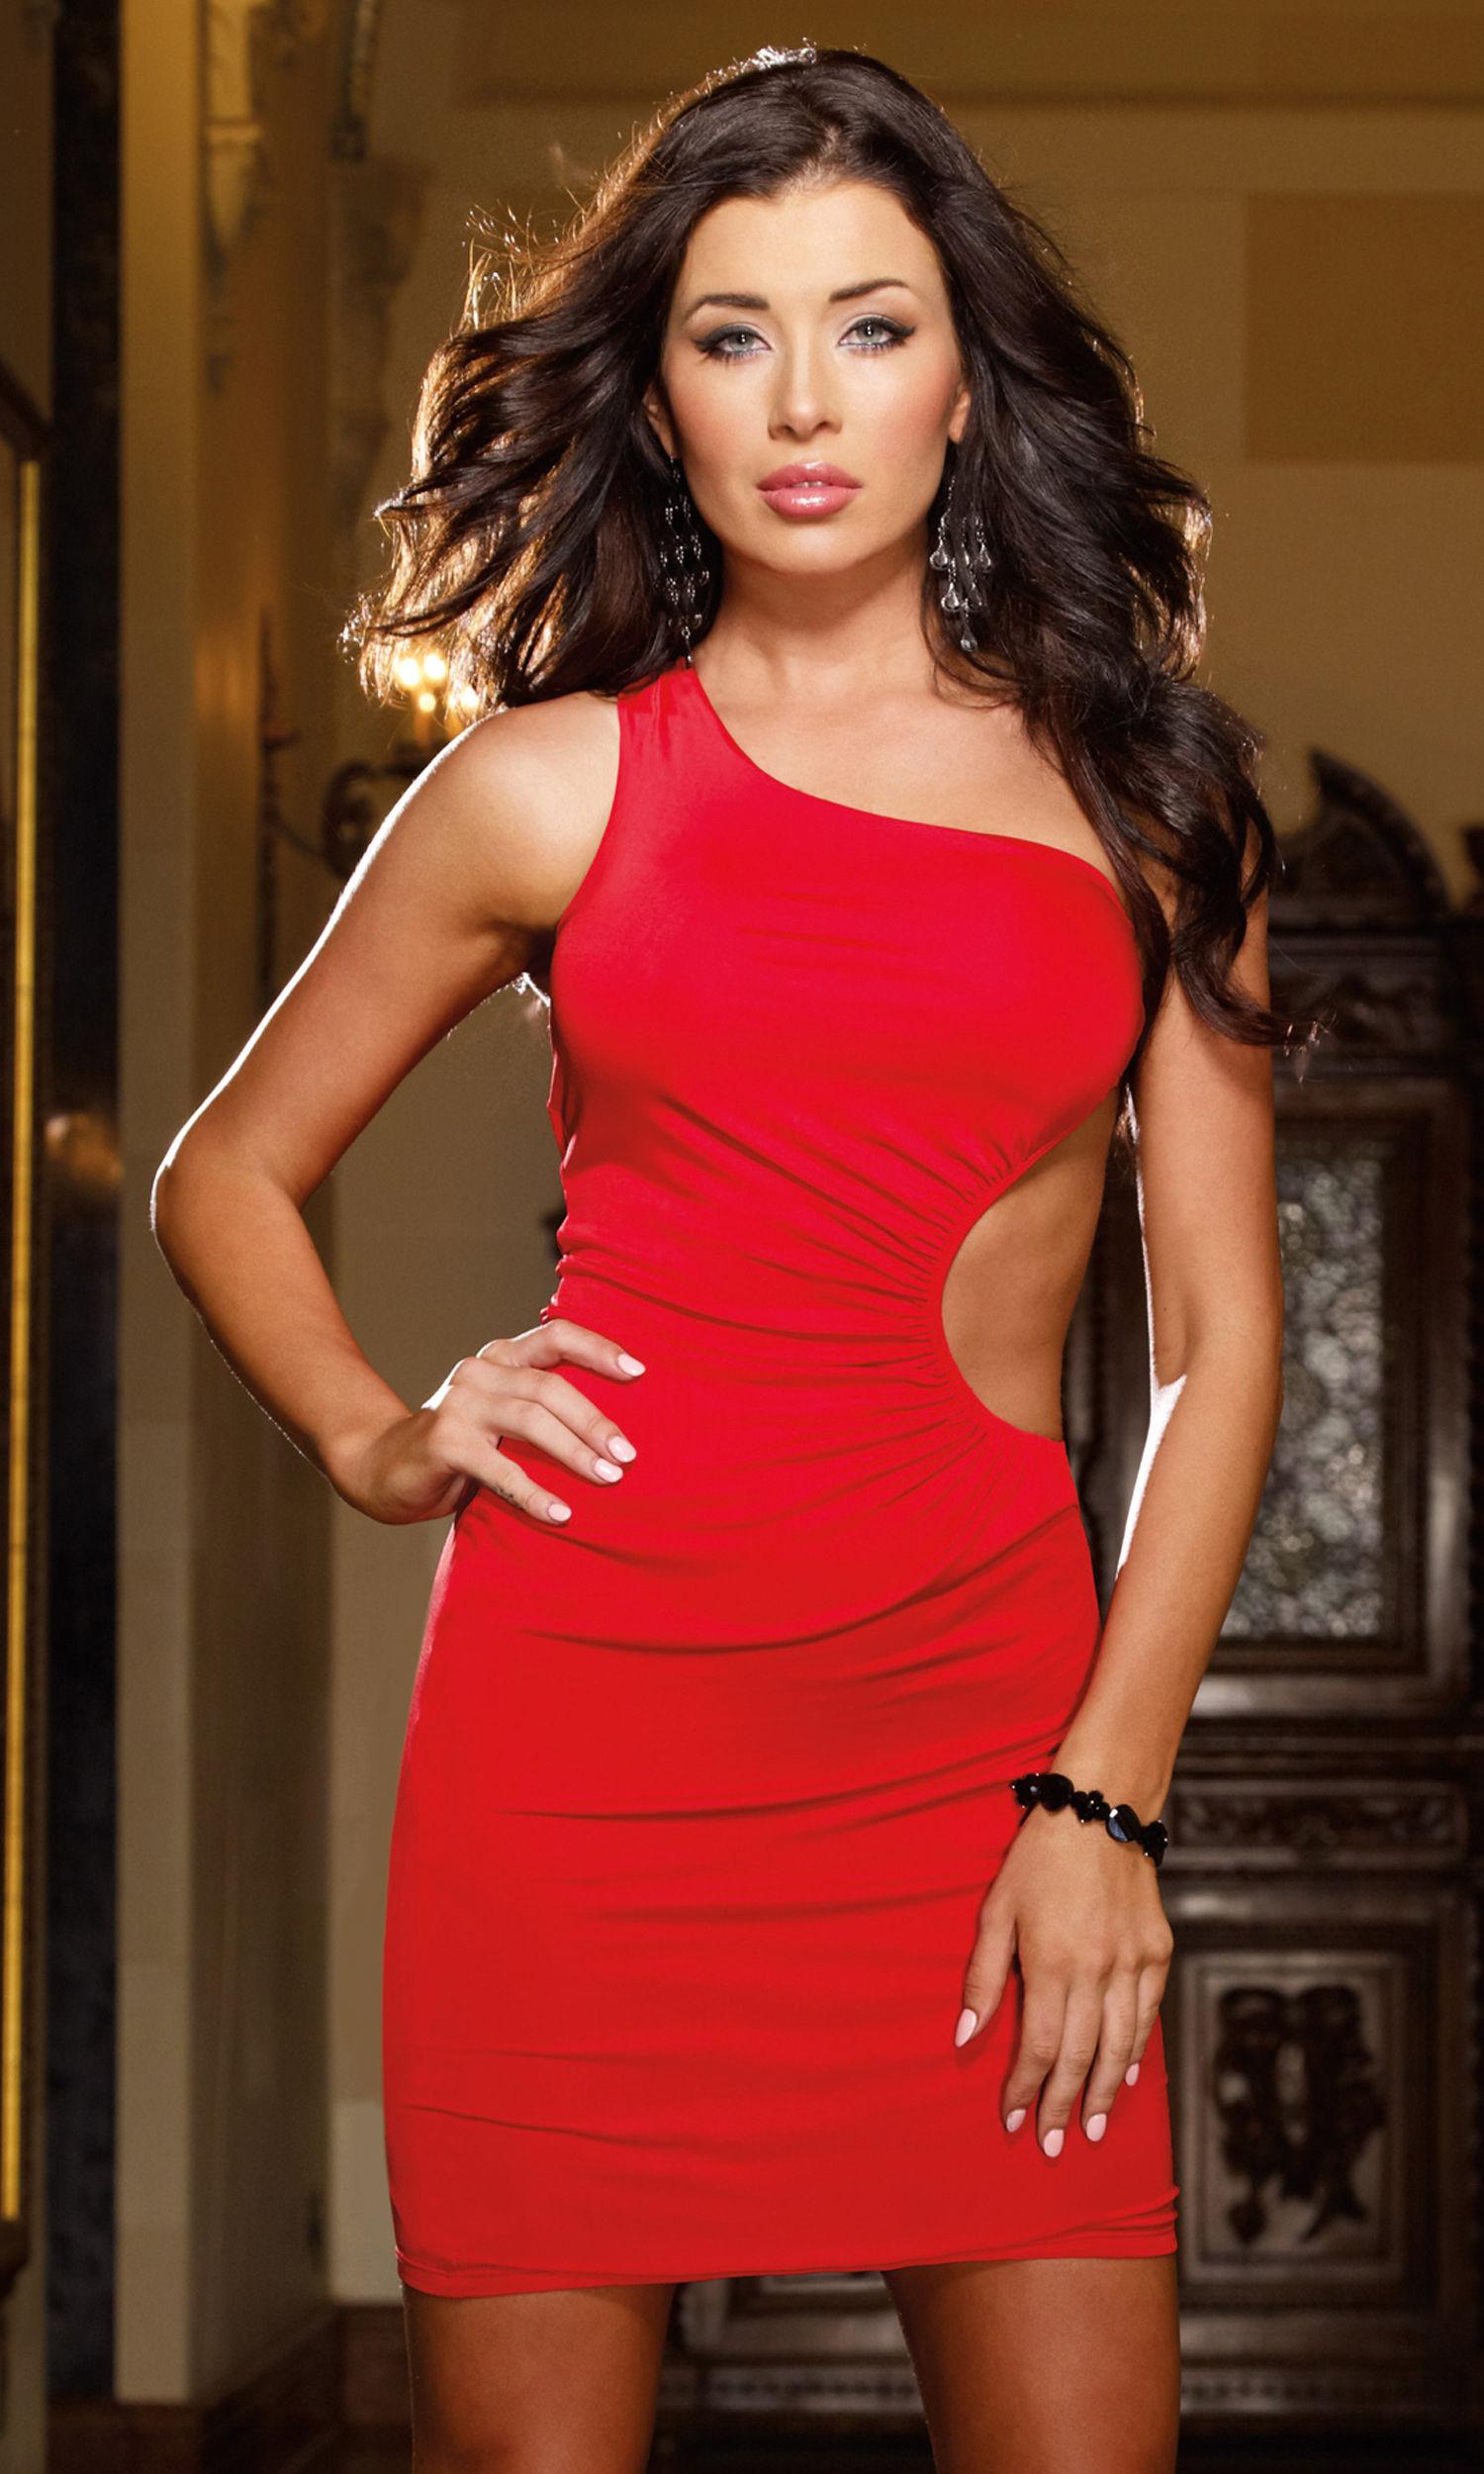 Dresses Lingerie Slinky Jersey One Shoulder Dress With